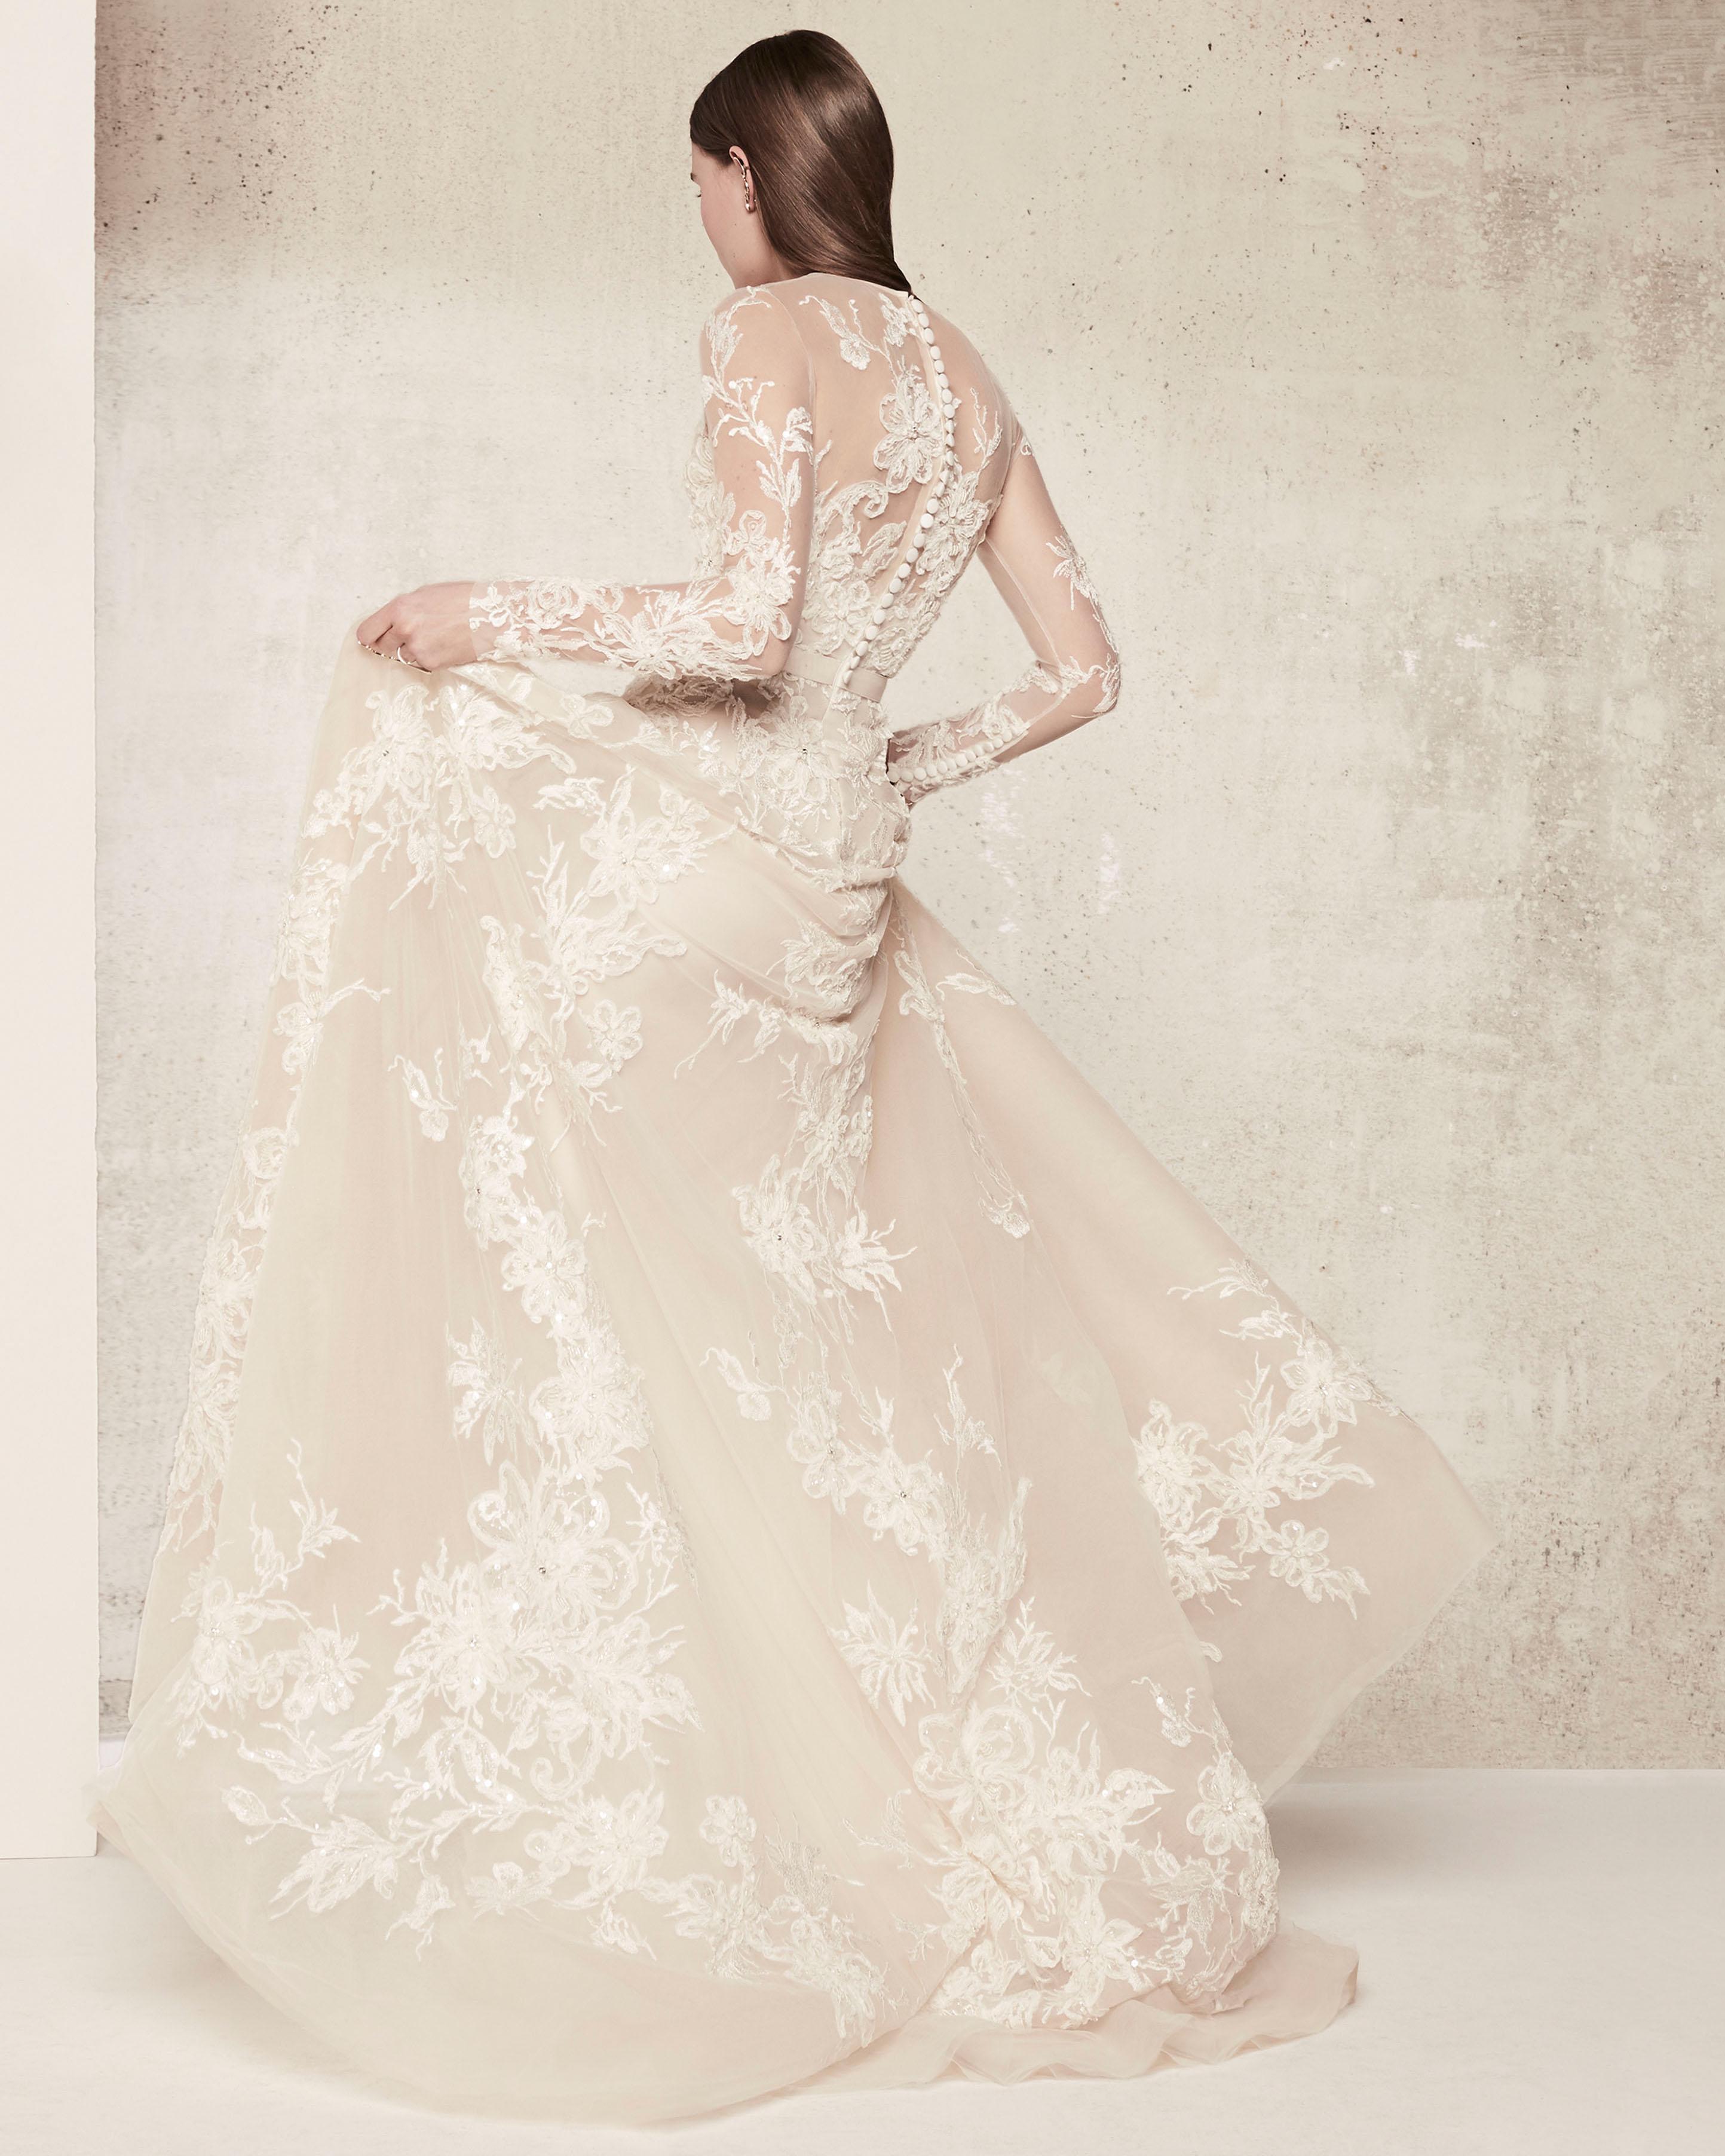 Wedding Gown Elie Saab: Elie Saab Spring 2018 Wedding Dress Collection